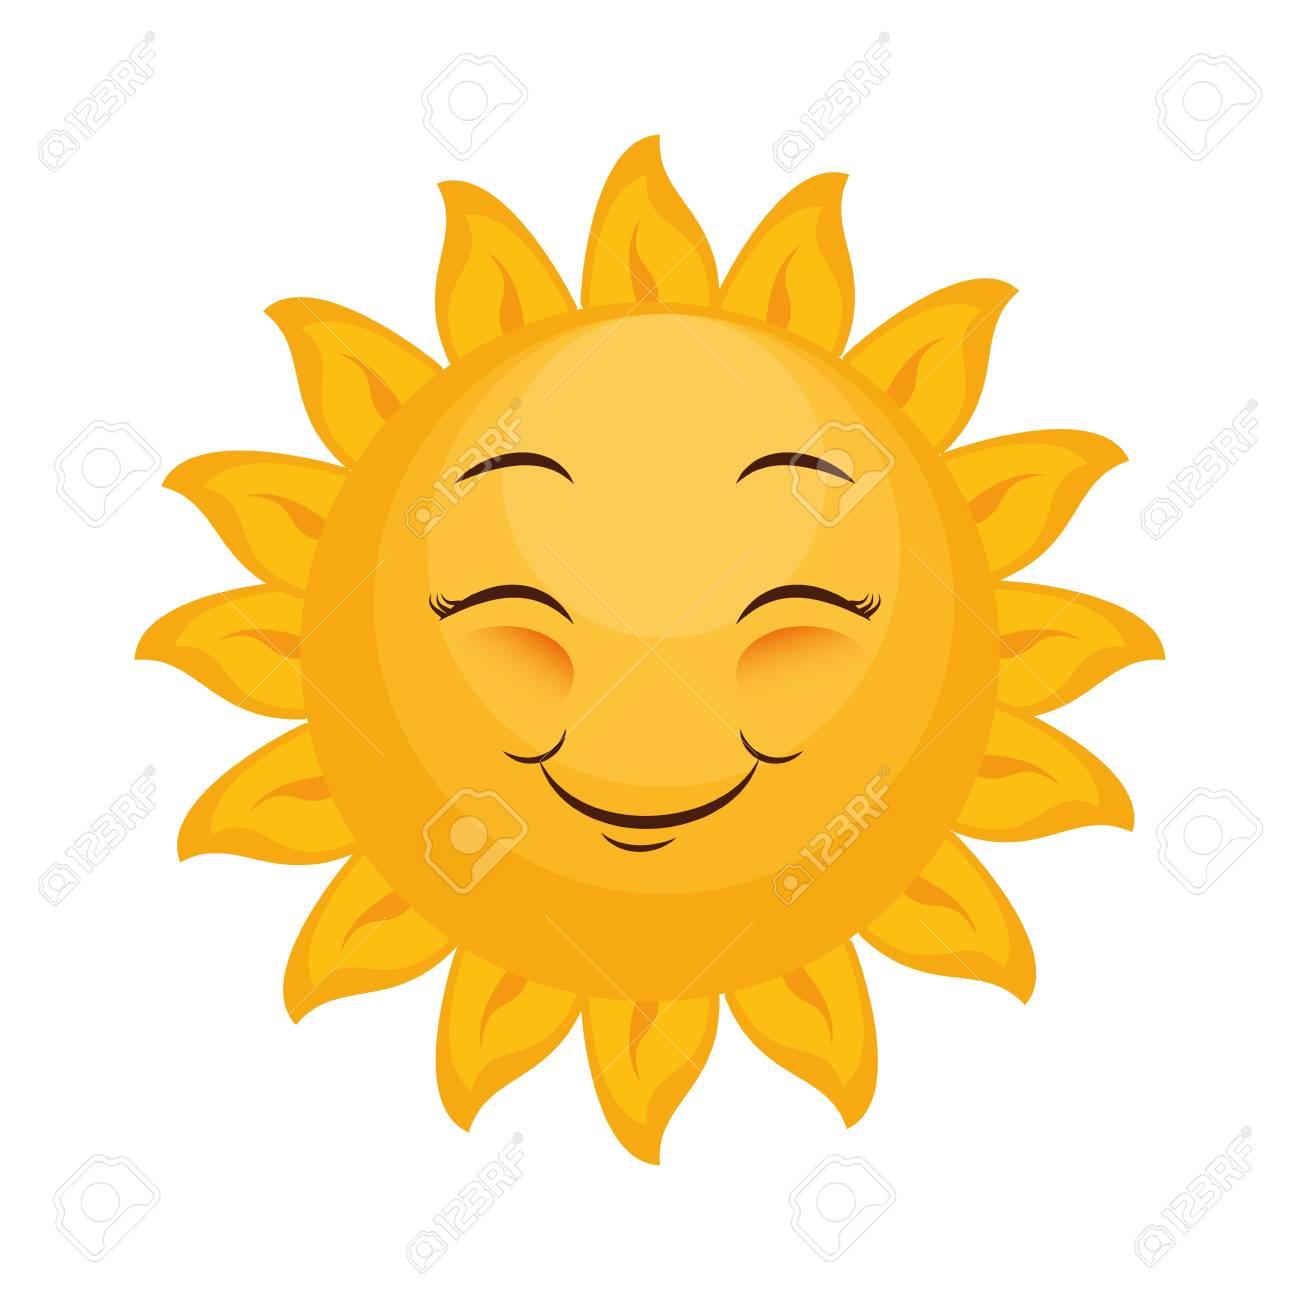 isolated yellow sun face icon vector illustration graphic design rh 123rf com Sun Face Drawings Happy Face Sun